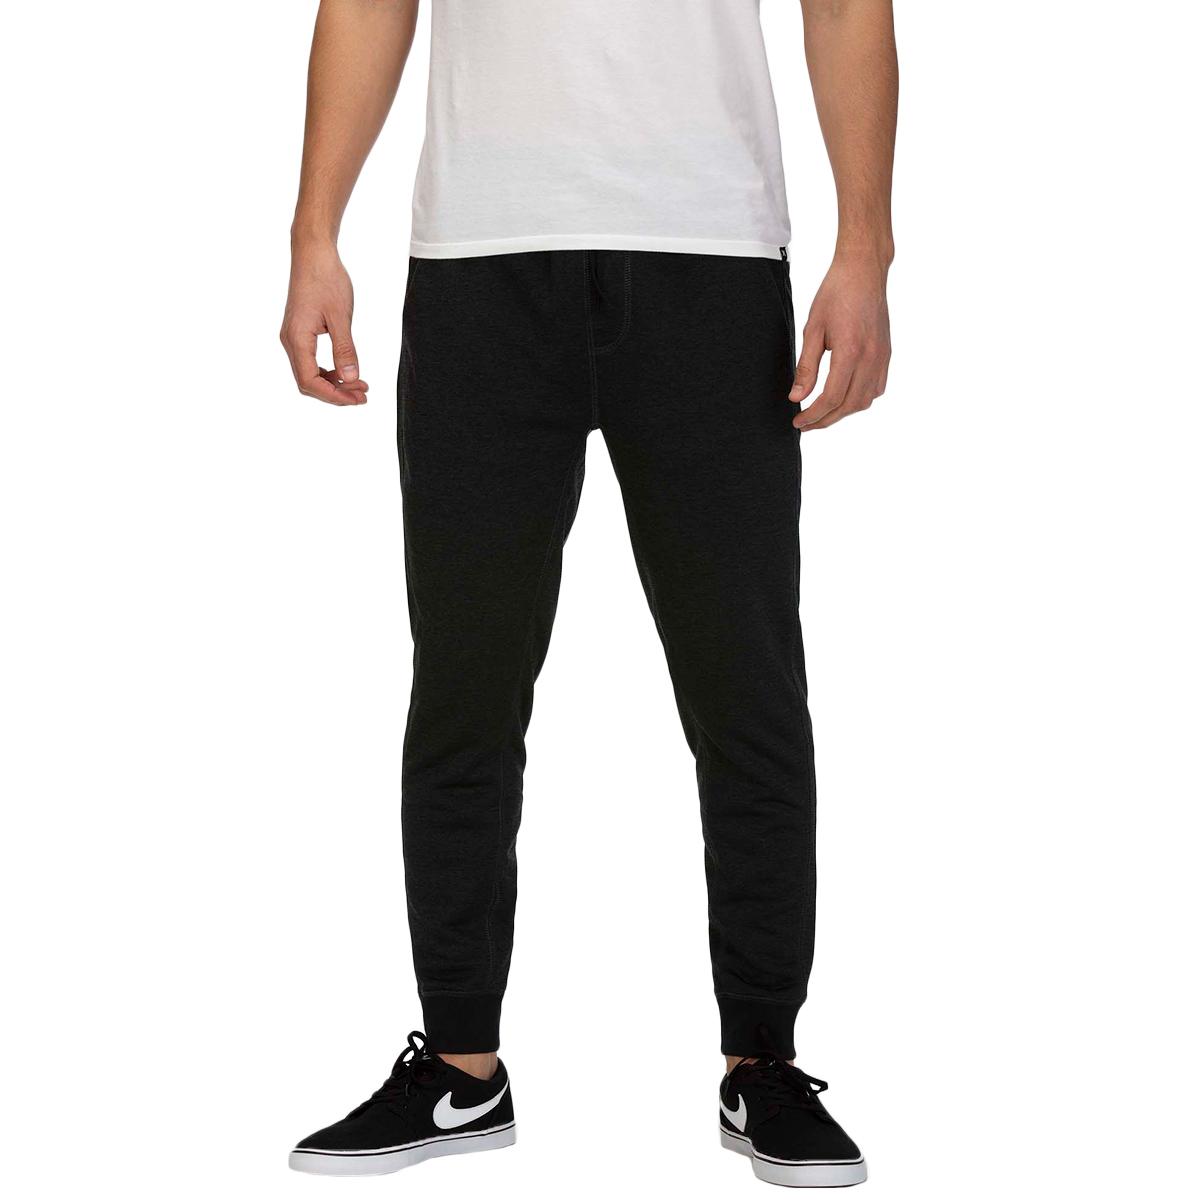 Hurley Men's Disperse Pant - Black, L